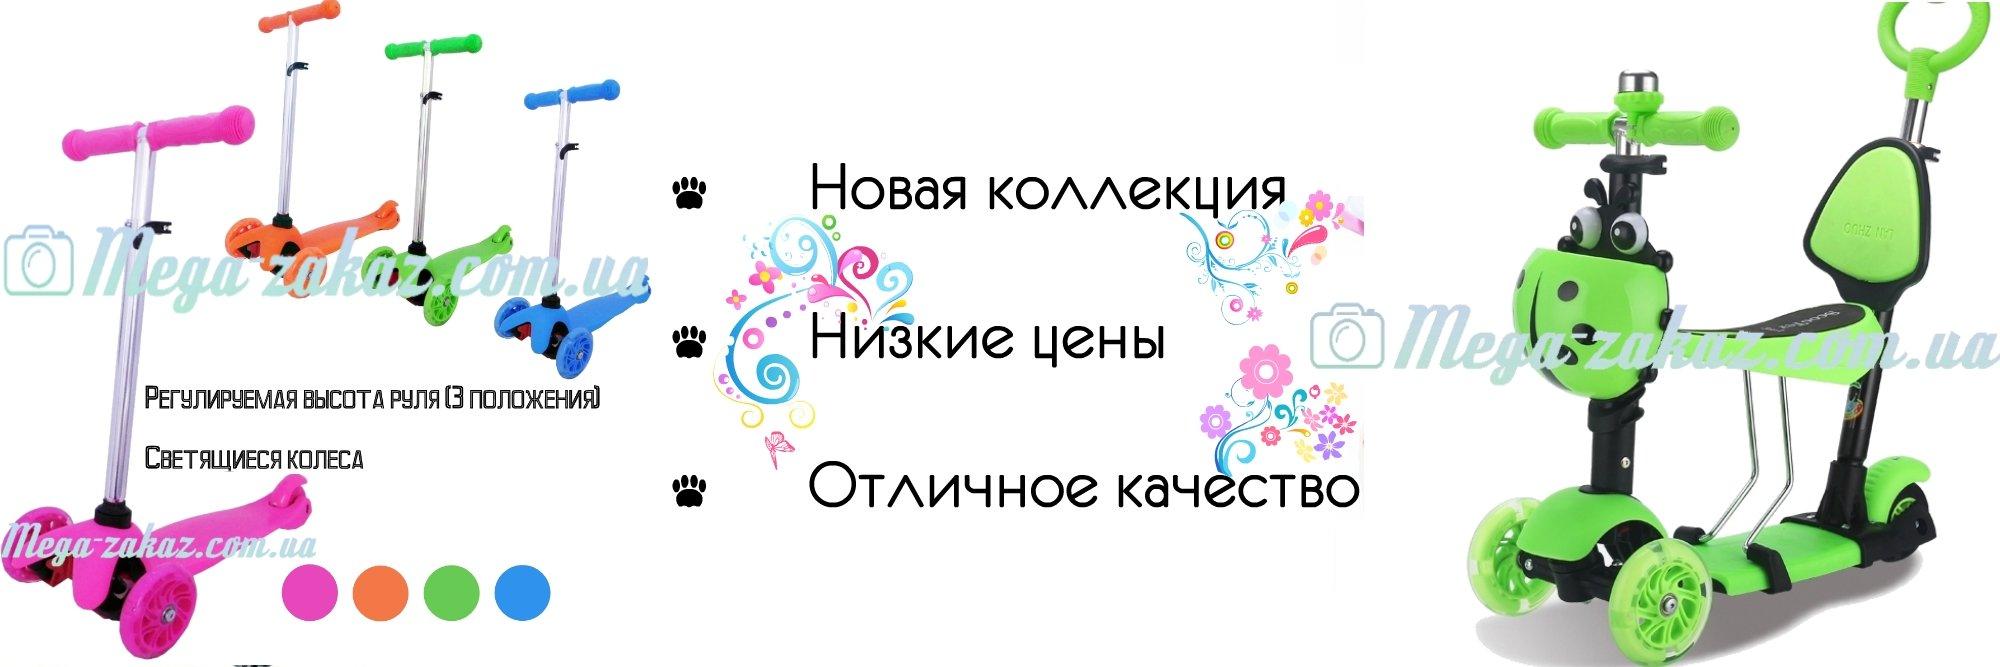 https://mega-zakaz.com.ua/images/upload/коллаж%20самокаты.jpg